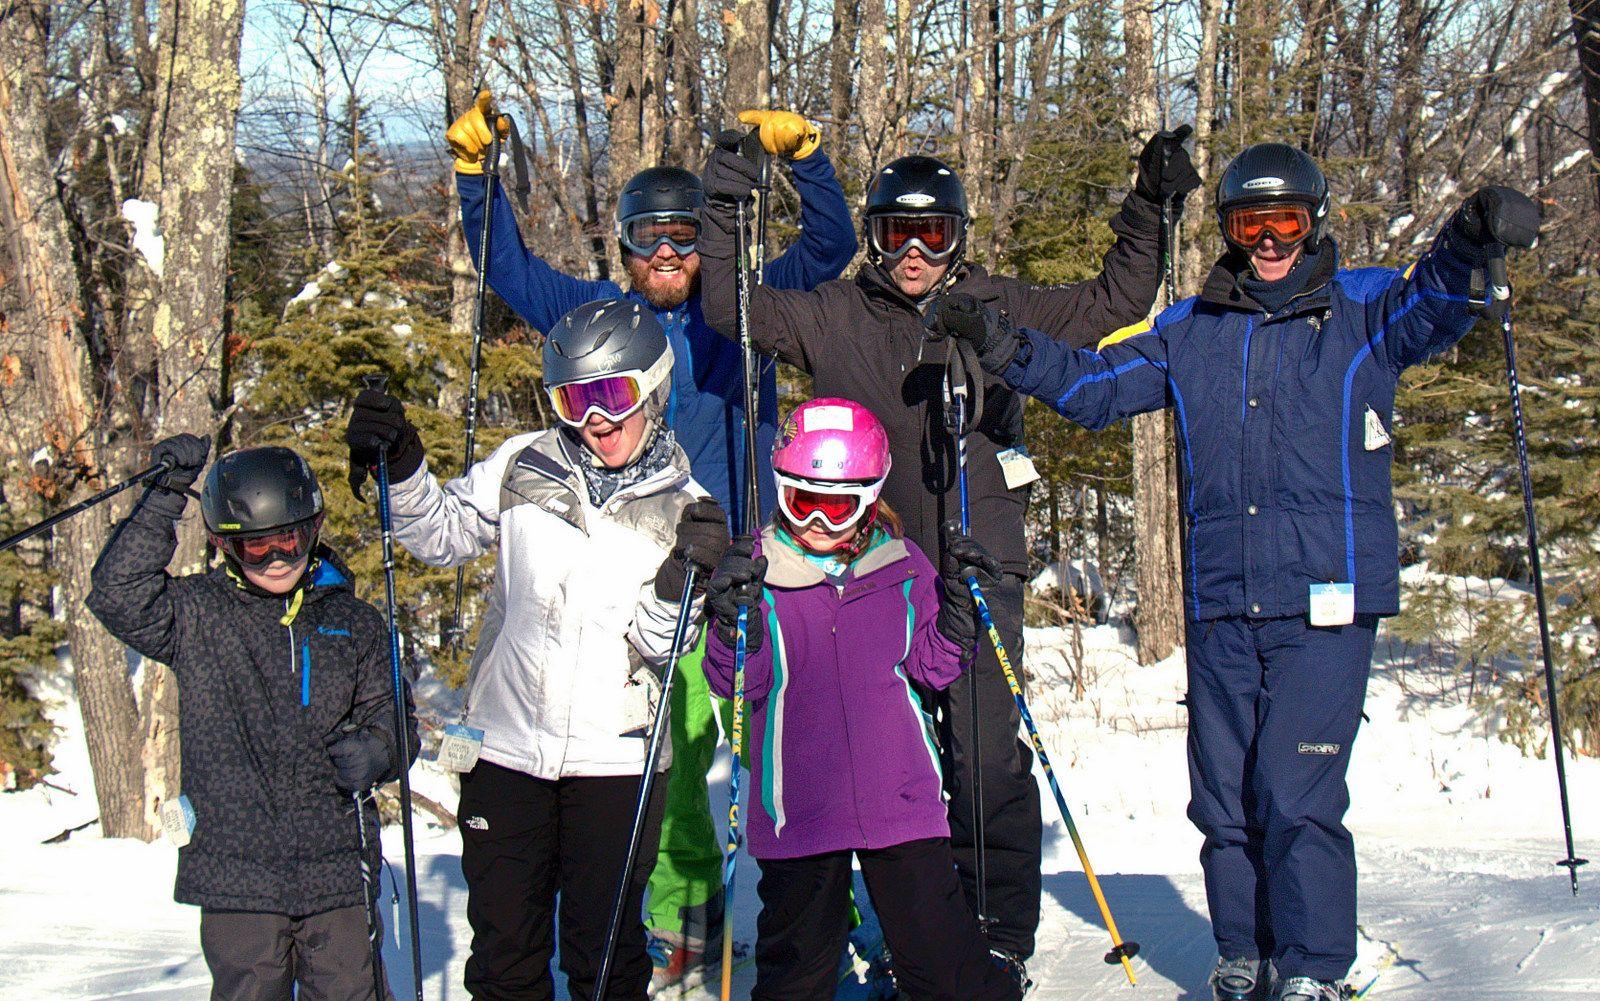 So Glad This Group Is Skiing At Giants Ridge Photo Paul Pluskwik Giantsridge Onlyinmn Mesabiismagic Cross Country Skiing Snow Sports Ski Trails